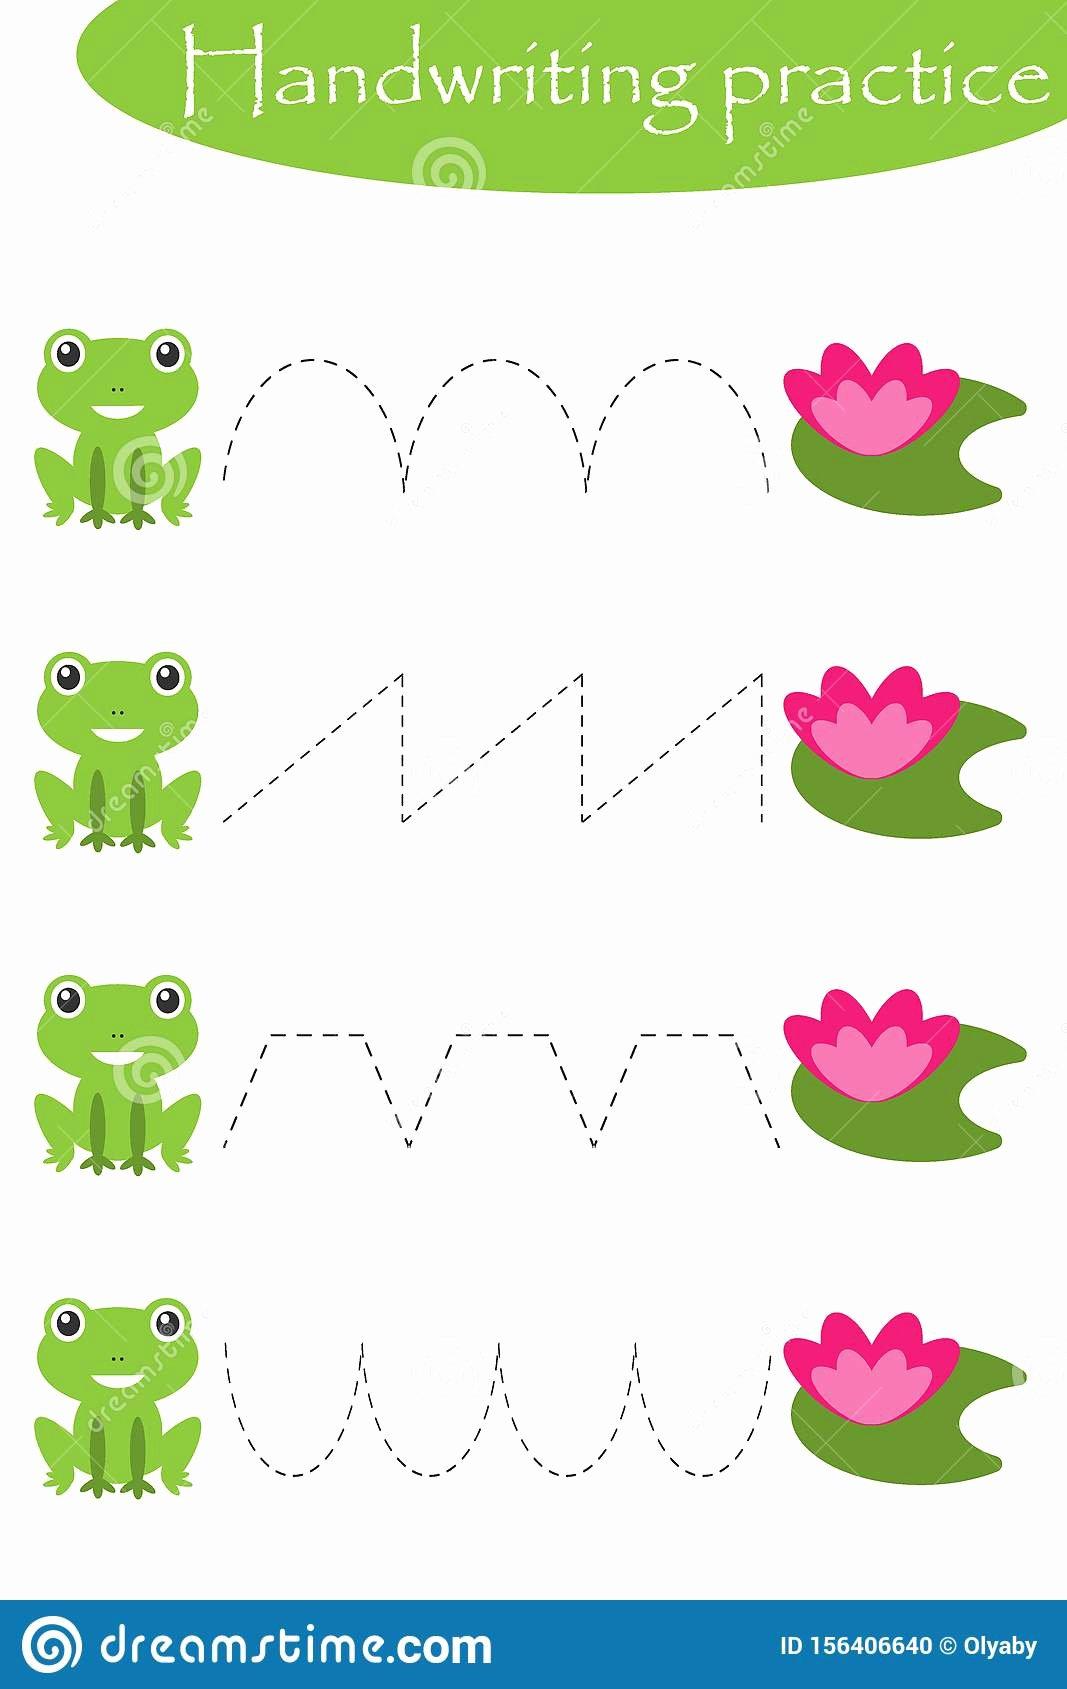 Frog Worksheets for Preschoolers Ideas Frogs and Water Lilies Handwriting Practice Sheet Kids